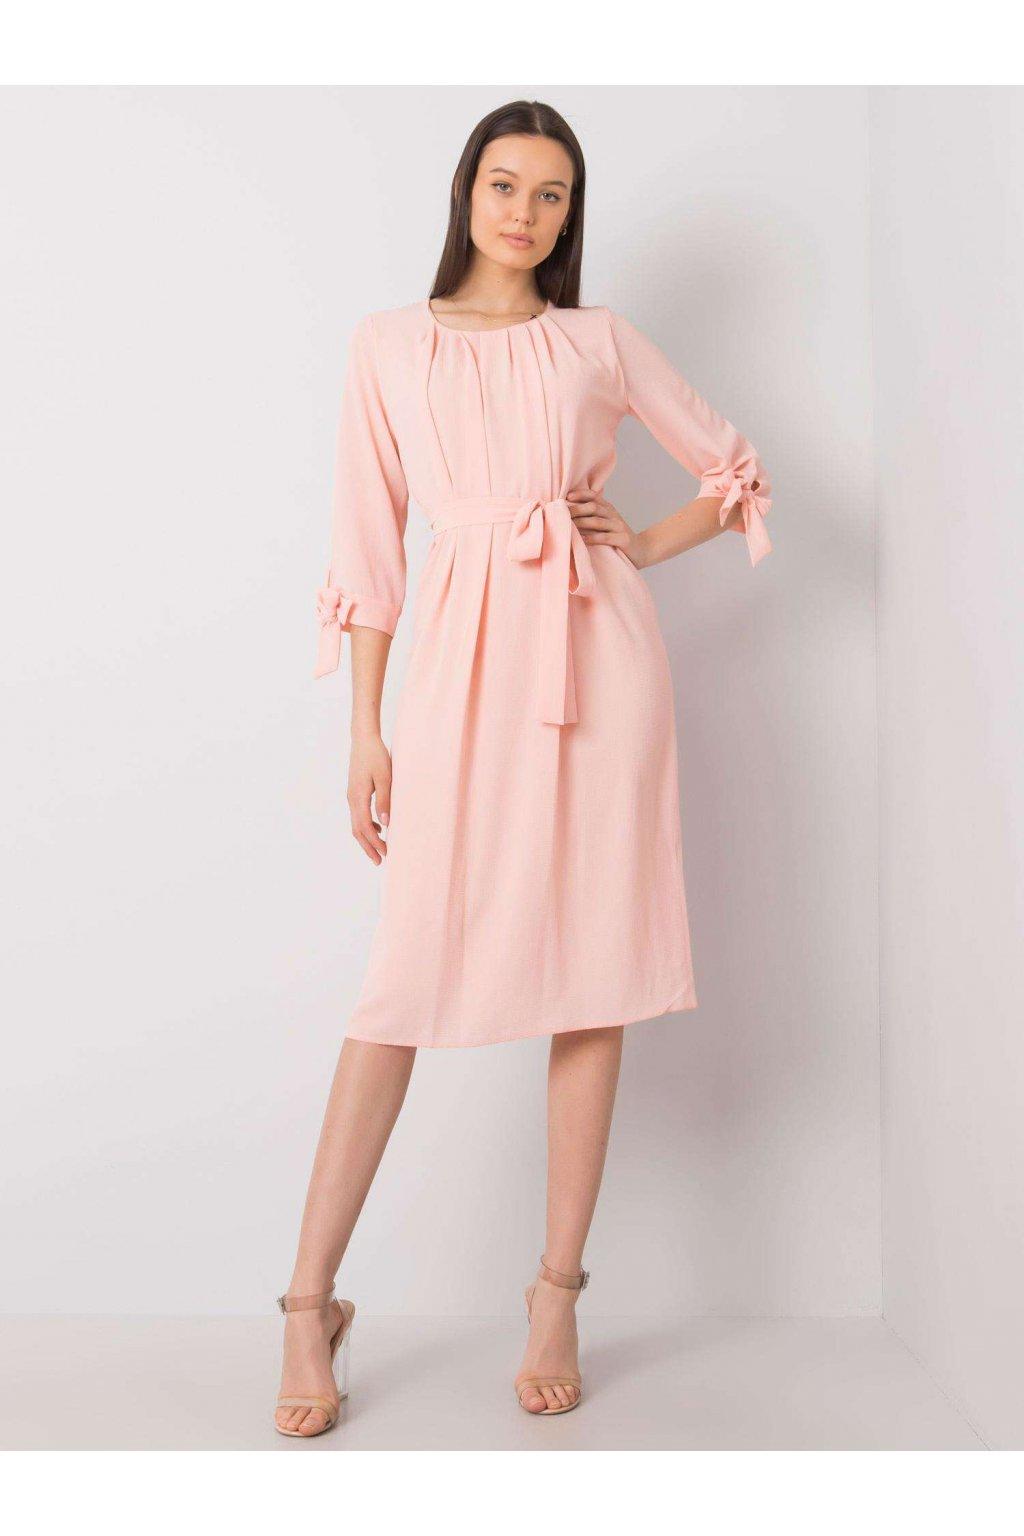 pol pl Jasnorozowa sukienka koktajlowa Alethea 366801 1